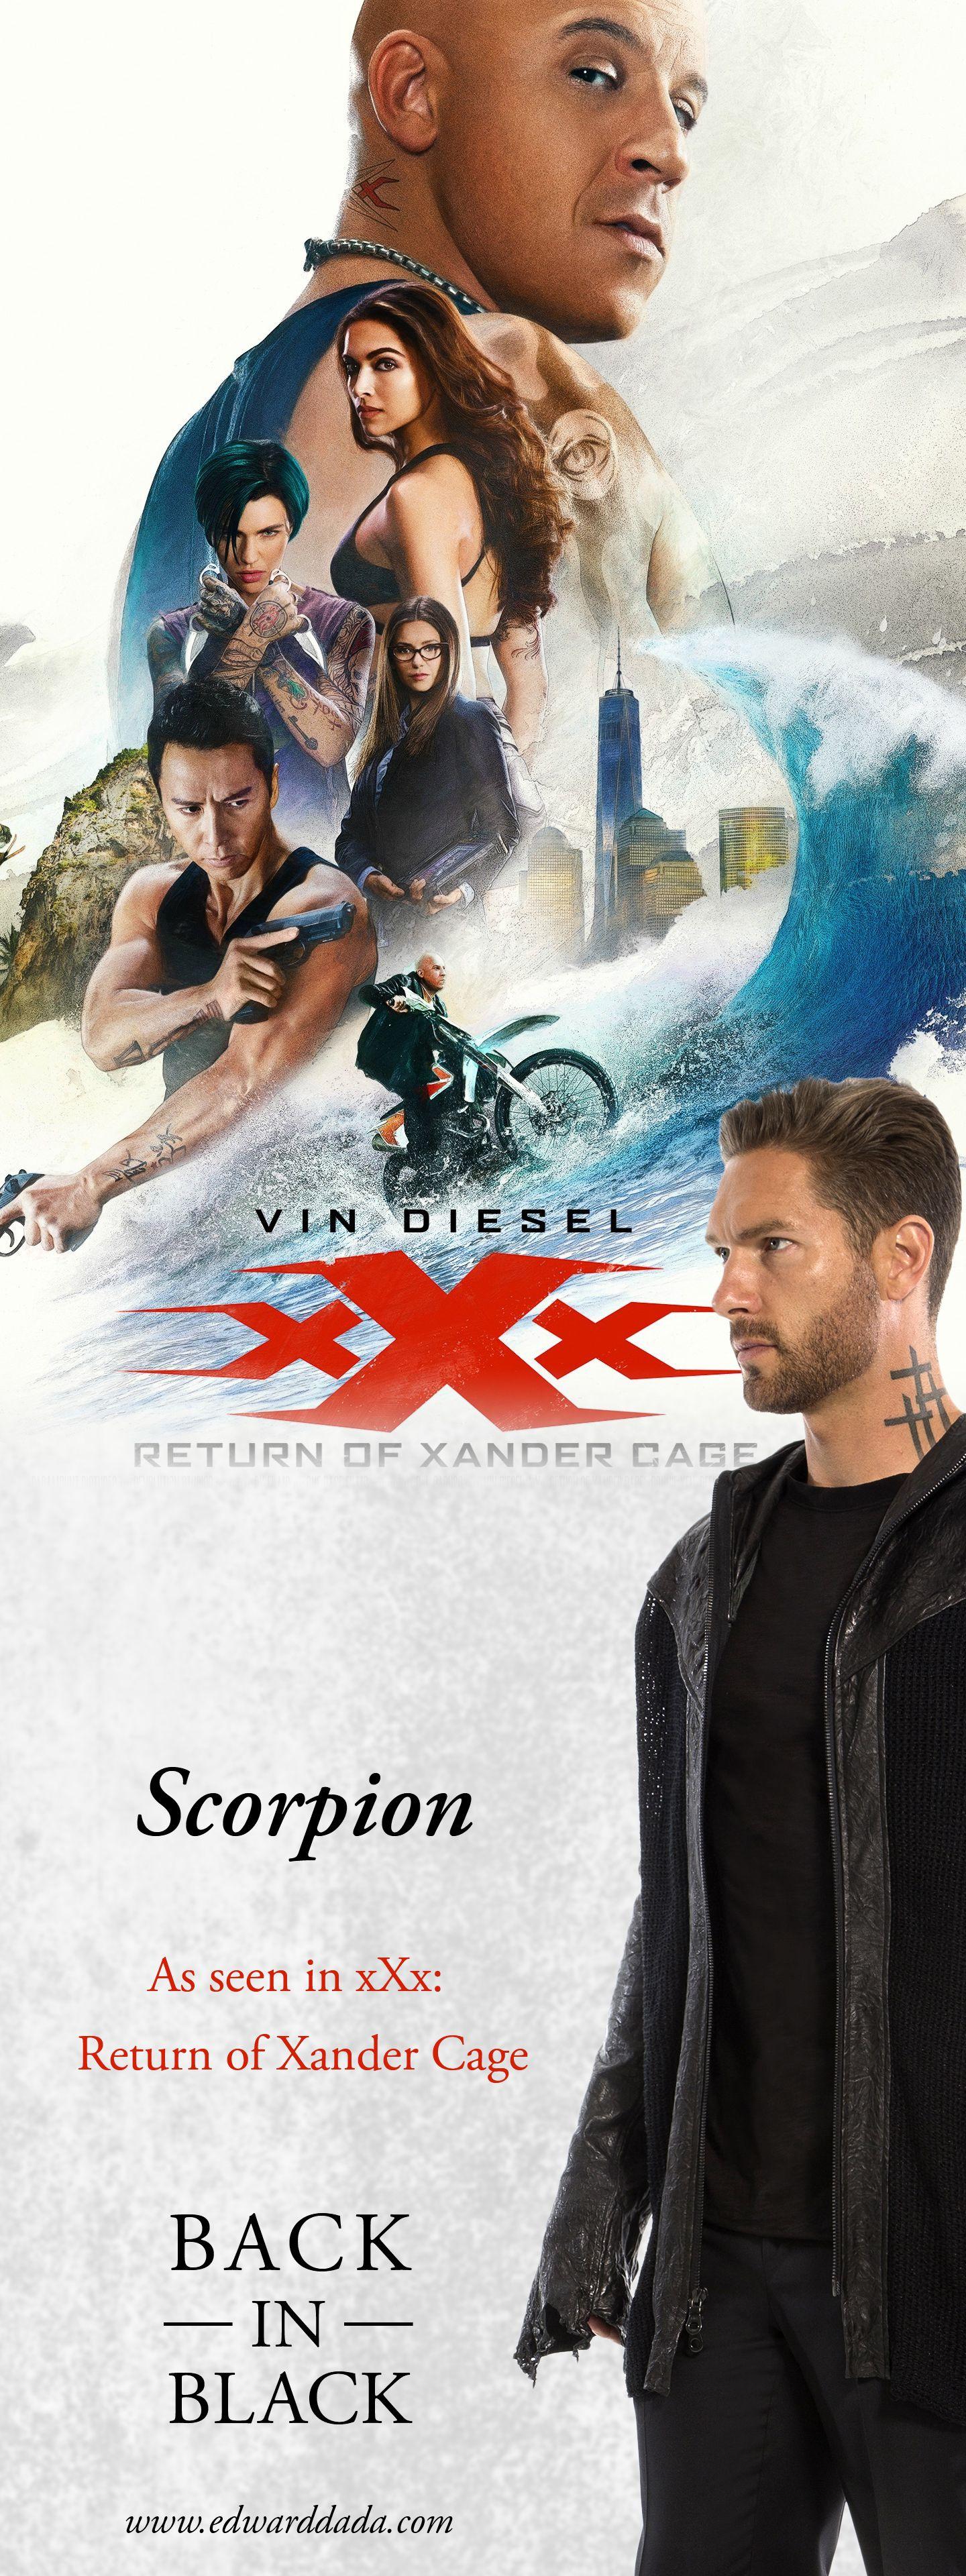 Xxx the movie the rokc